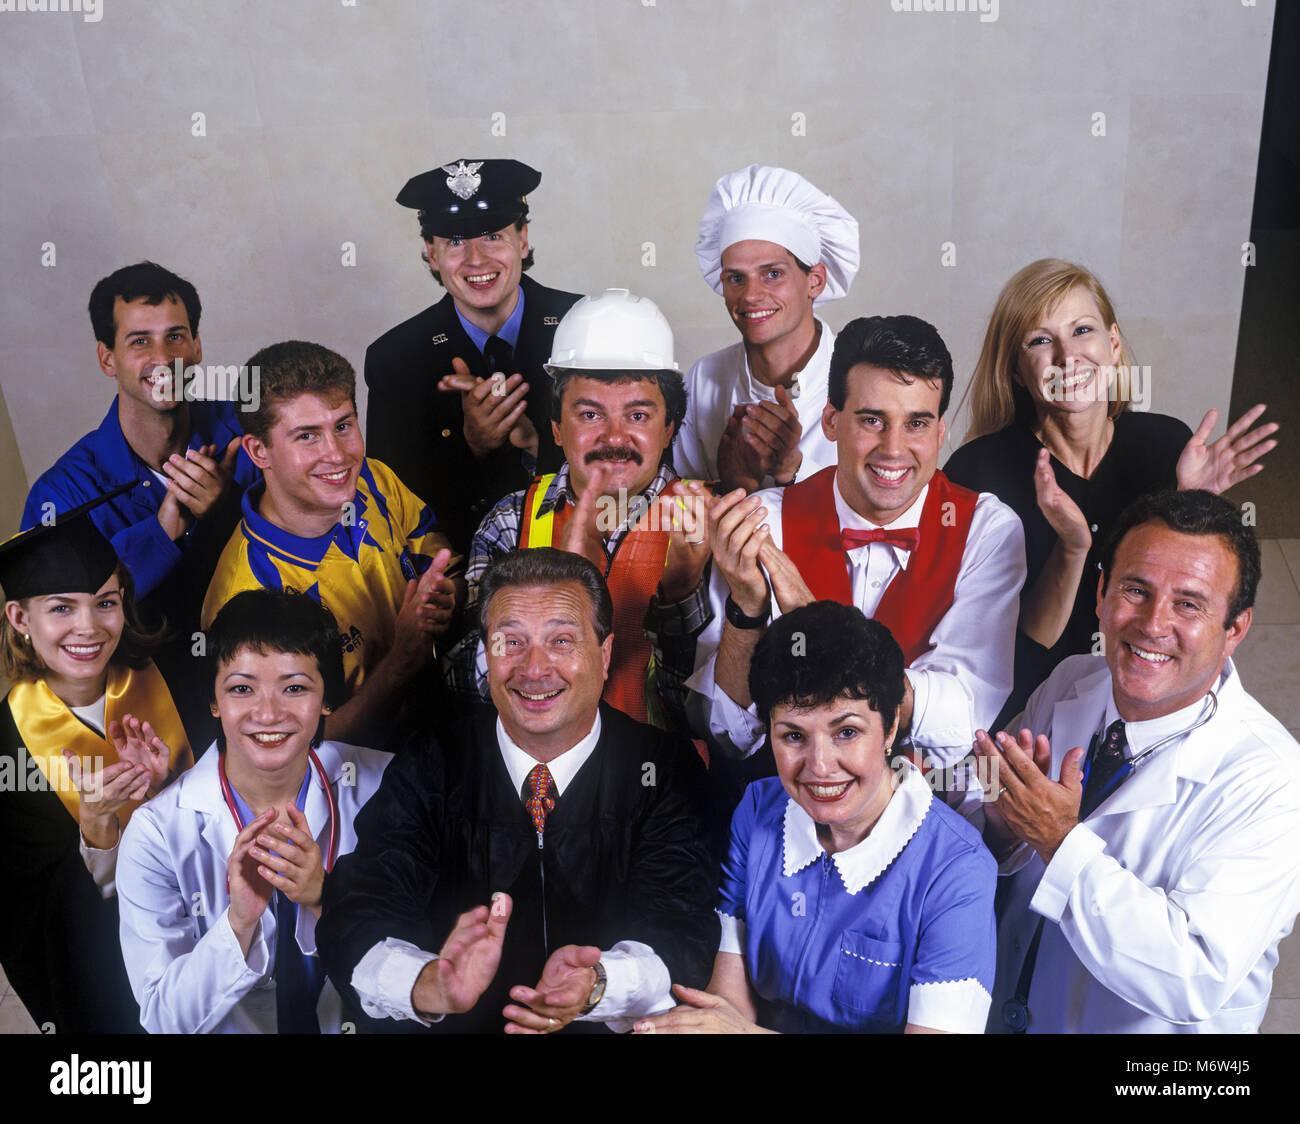 1996 histórico multiétnico grupo de ocupaciones Imagen De Stock